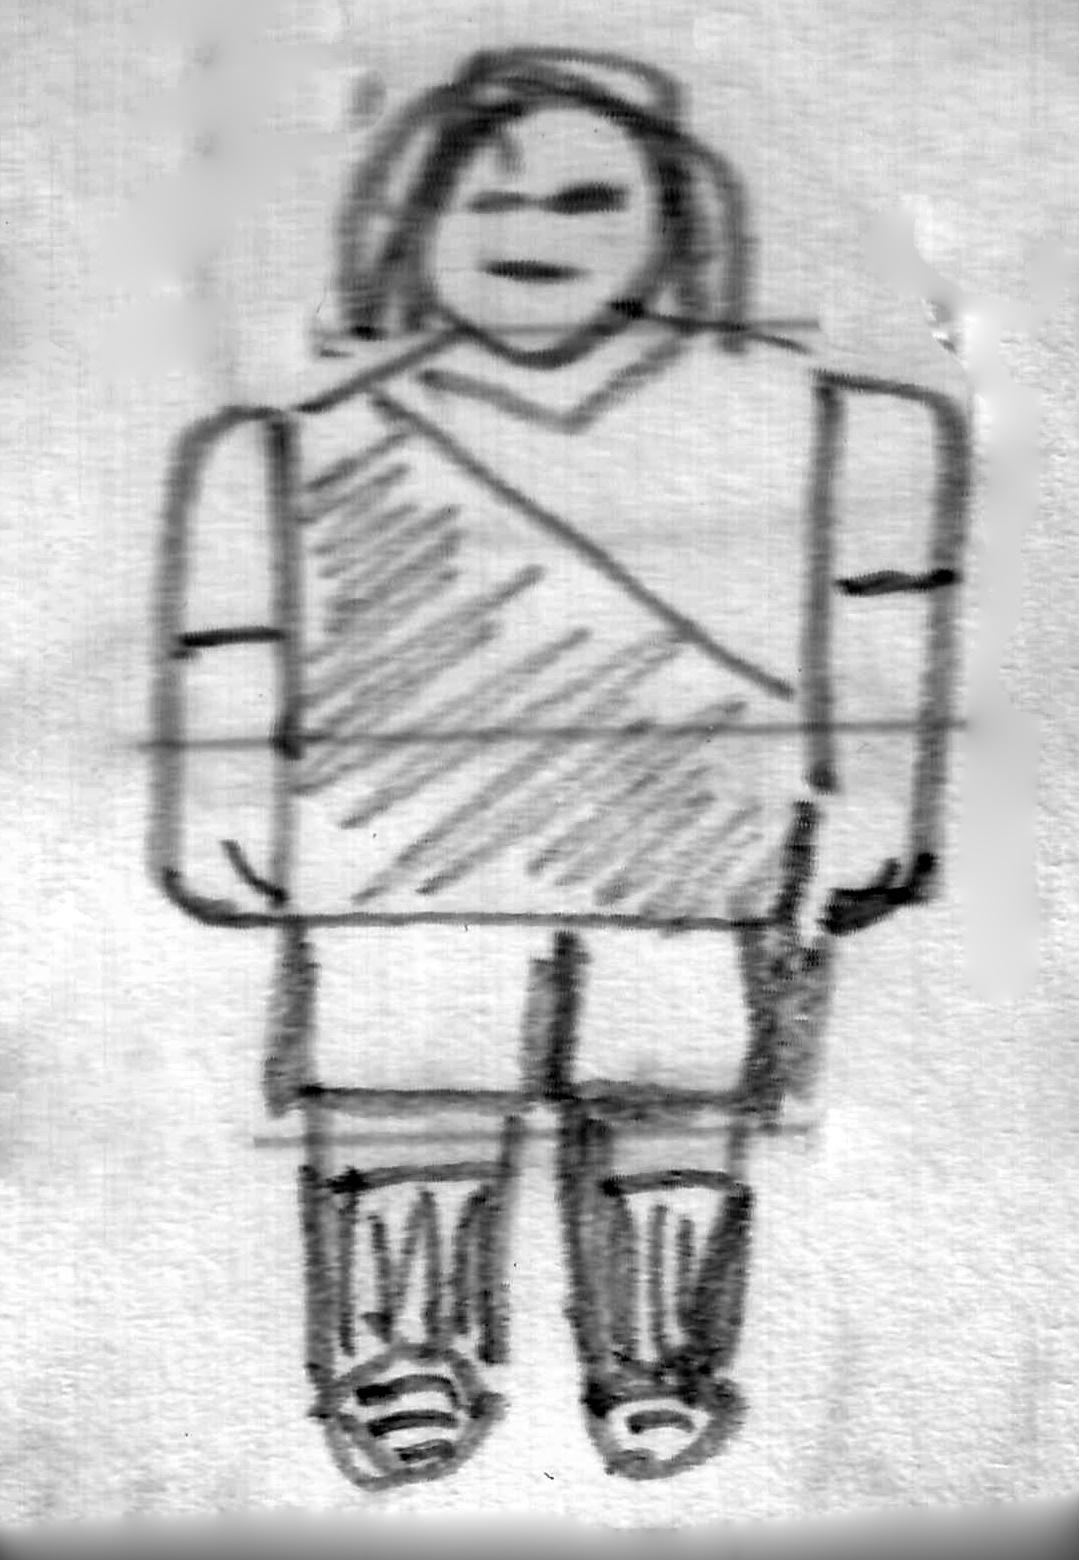 Gaston Cortes drawing